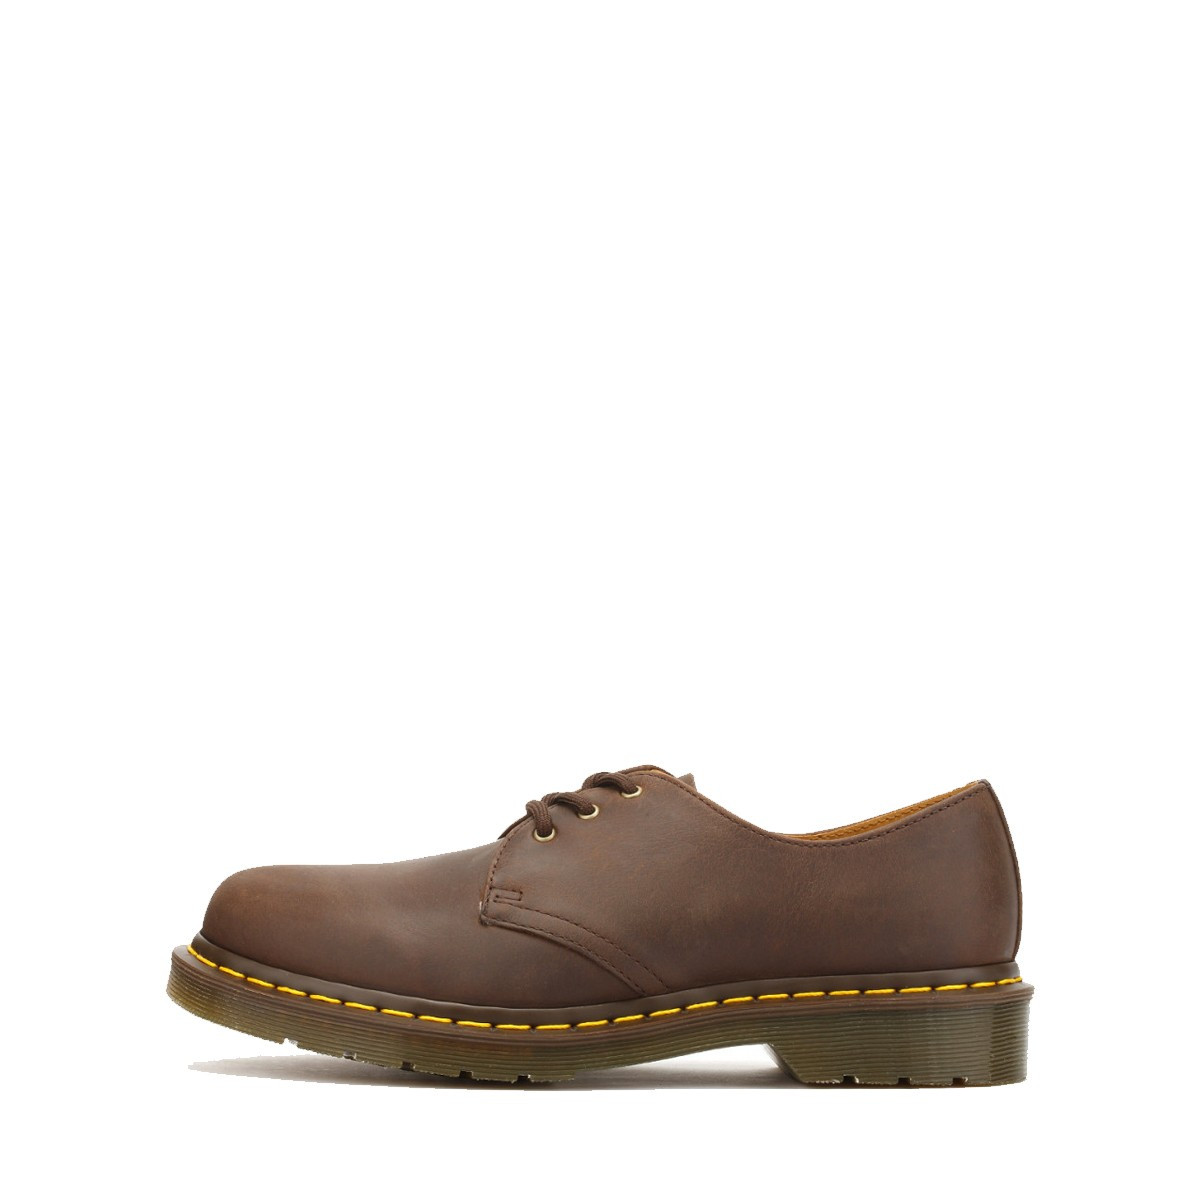 8cb155baff1 Chaussures à lacets Dr Martens GAUCHO CRAZY HORSE - DownTownStock.Com